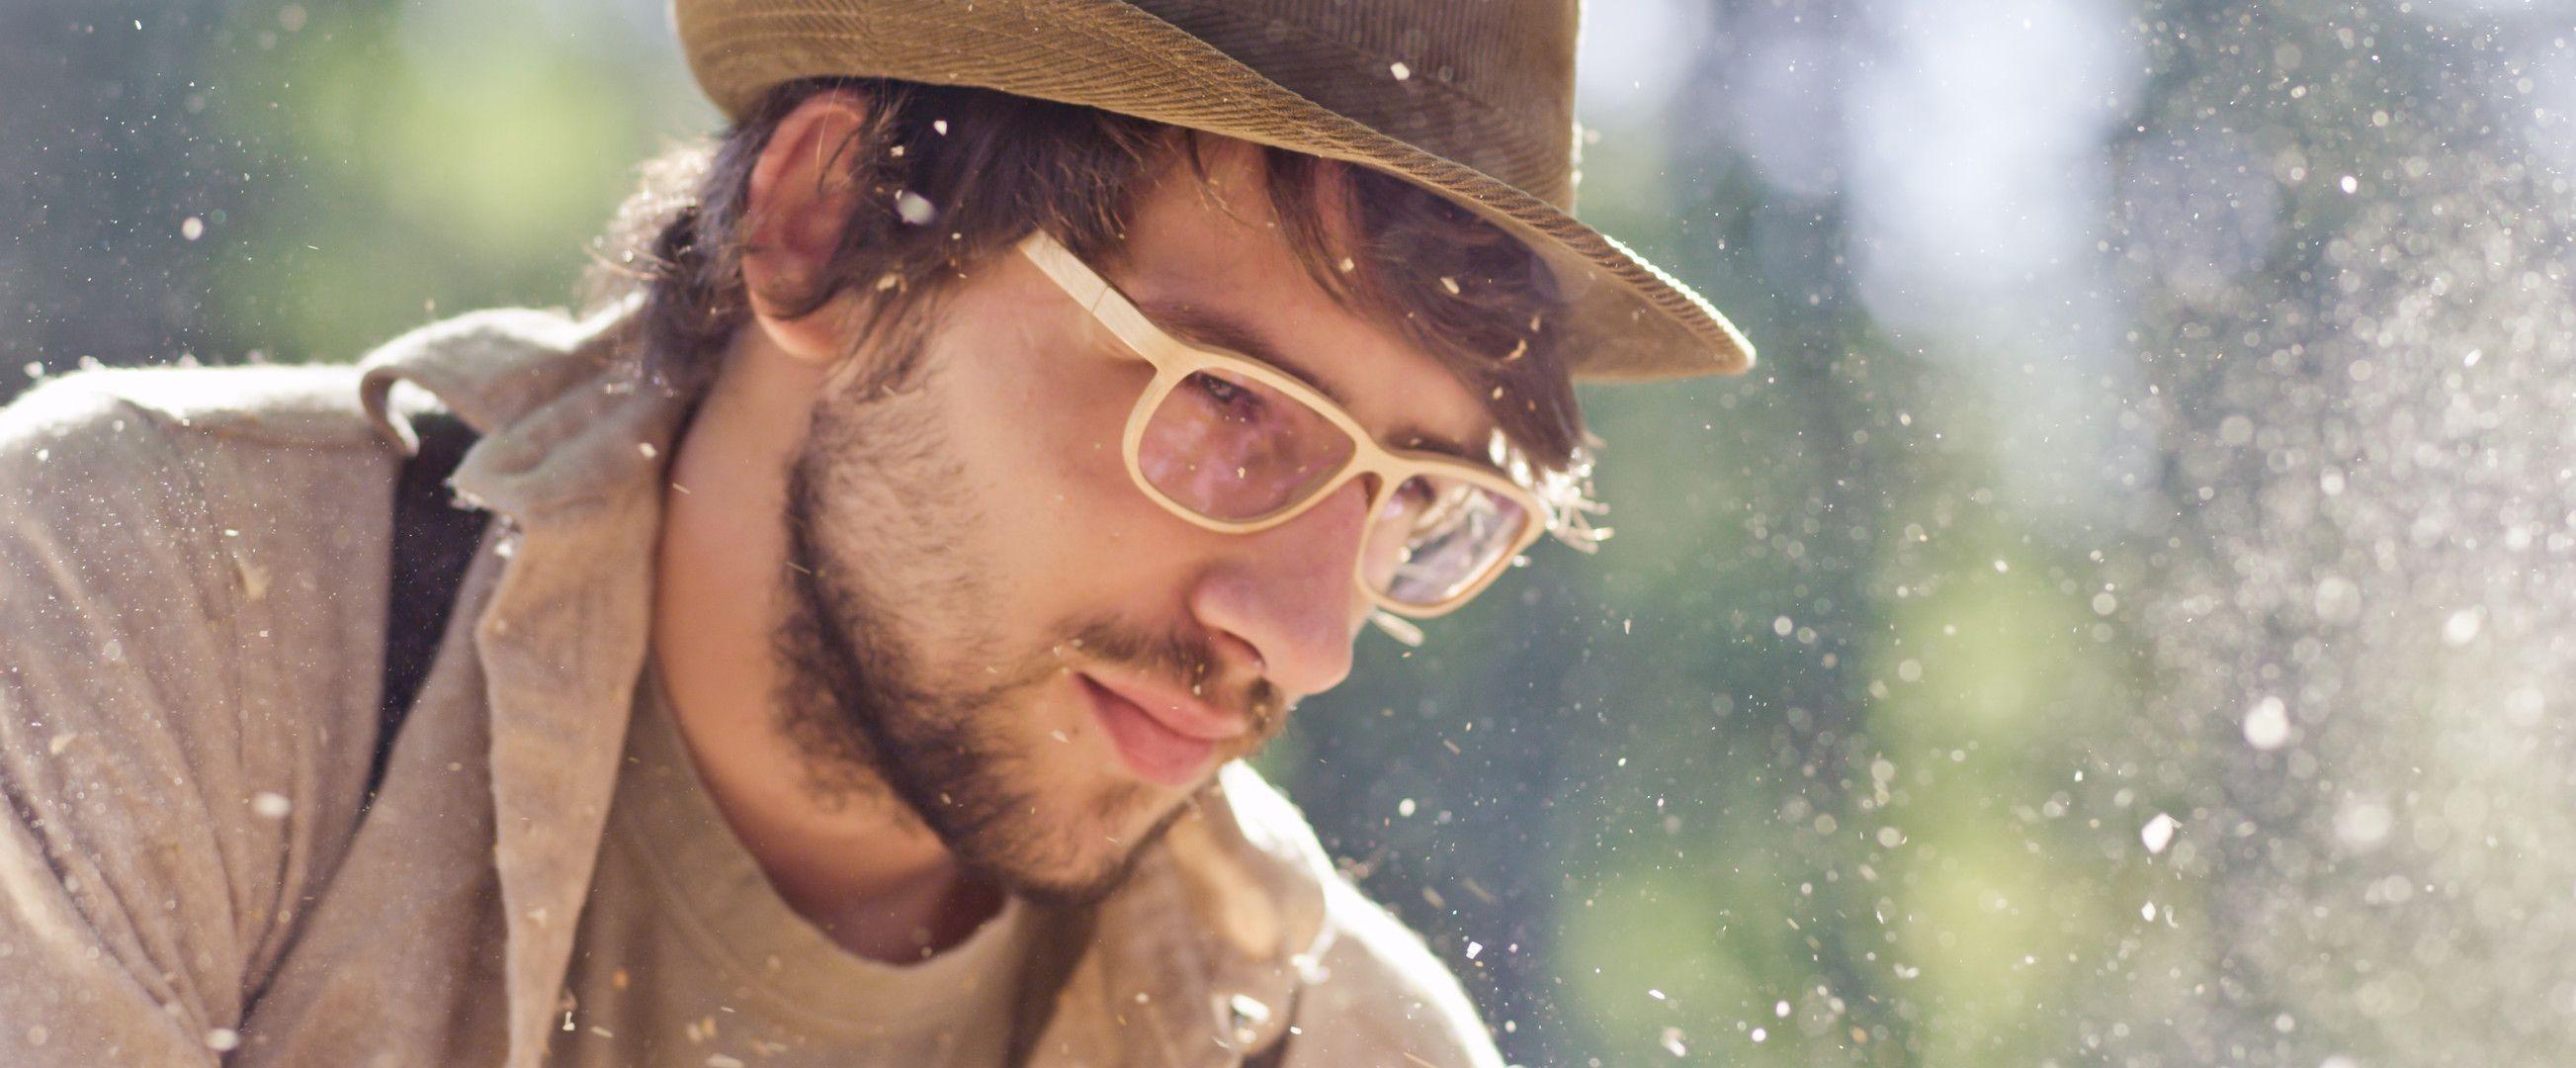 d3be1927c2 ROLF Spectacles - finest natural eyewear - www.vingerhoets-optics.be ...